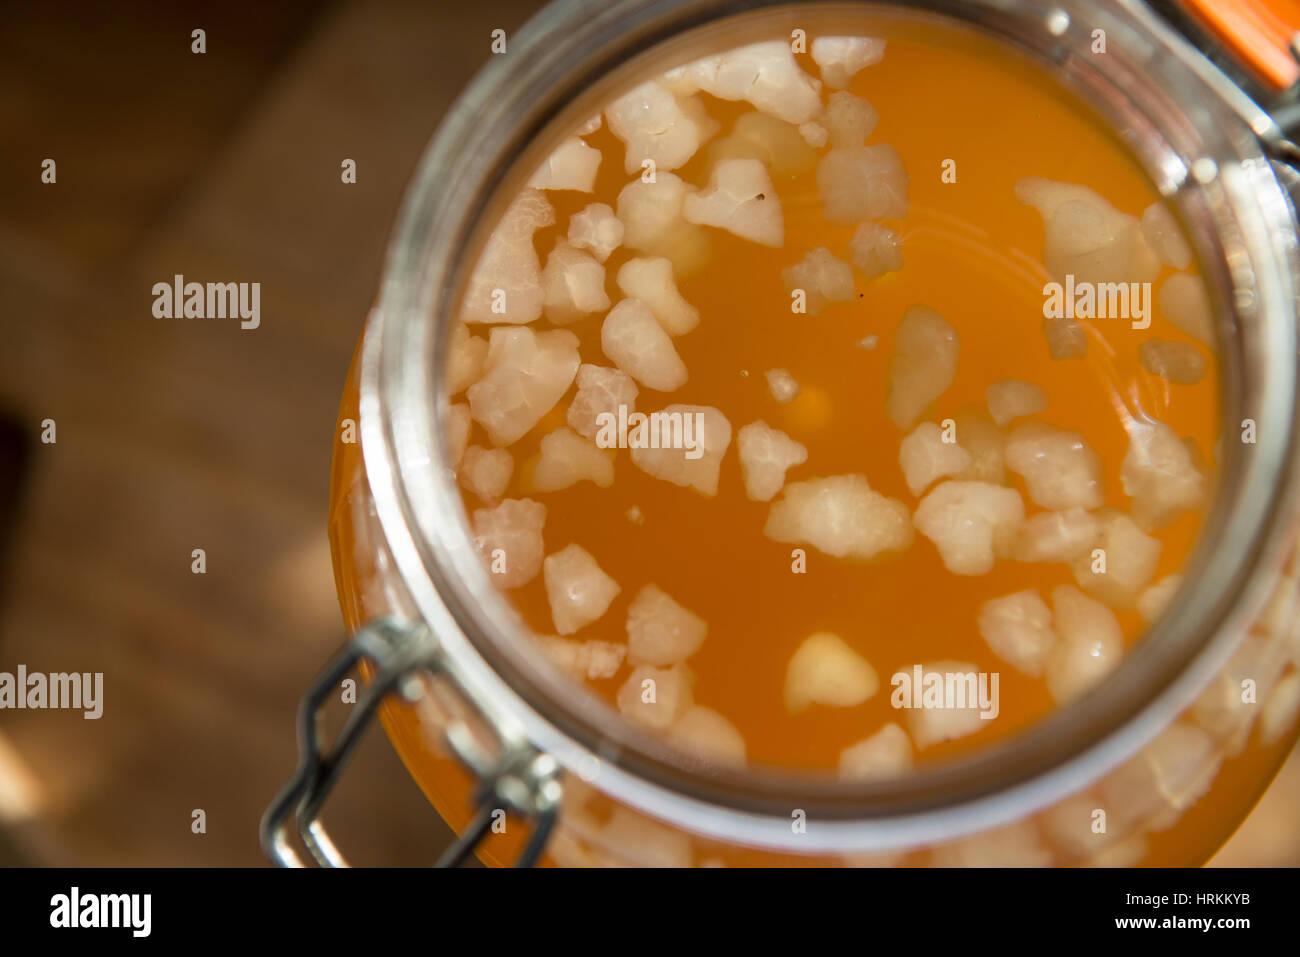 Homemade water kefir - Stock Image